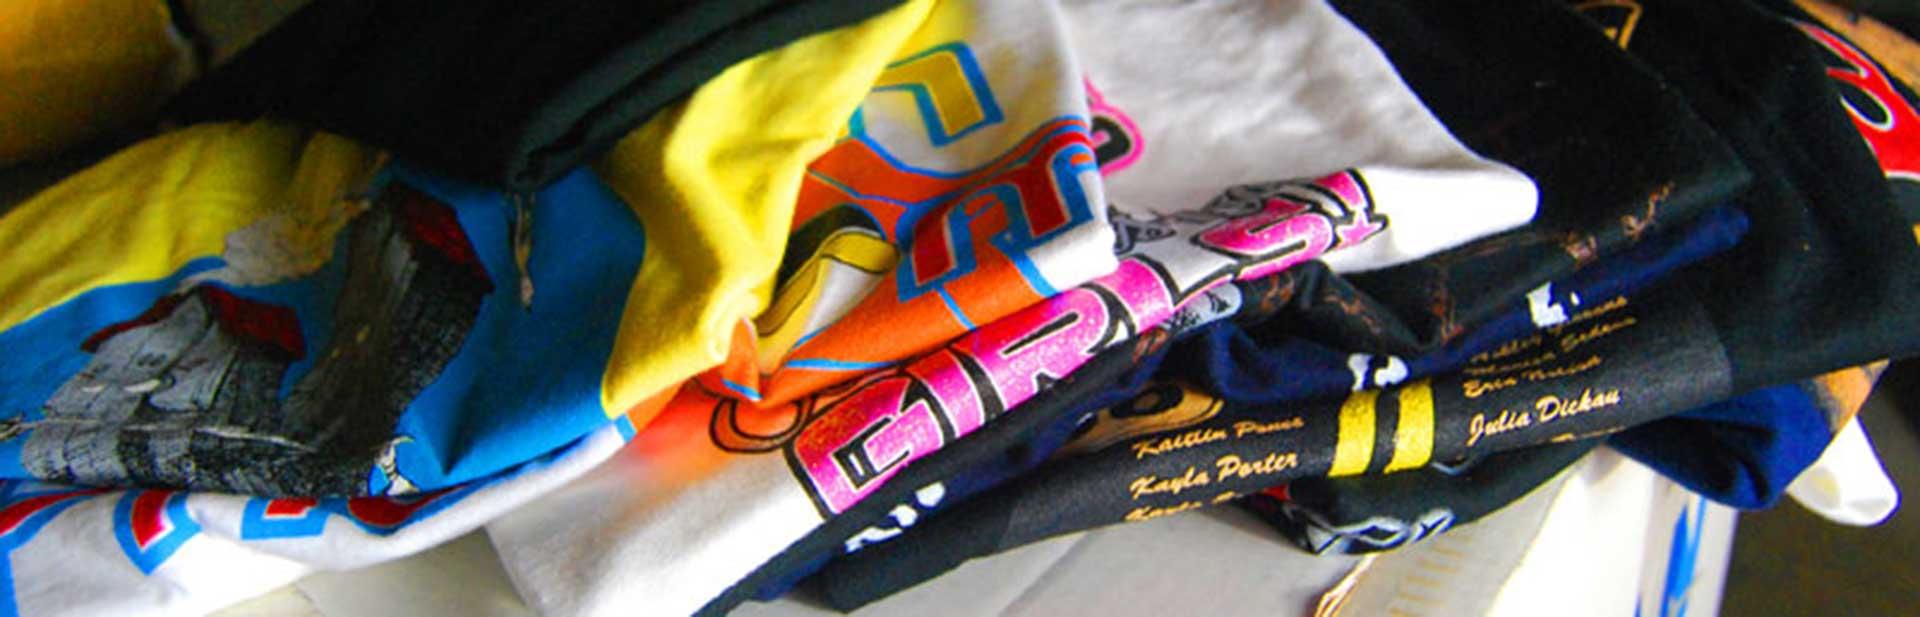 majice sito štampa